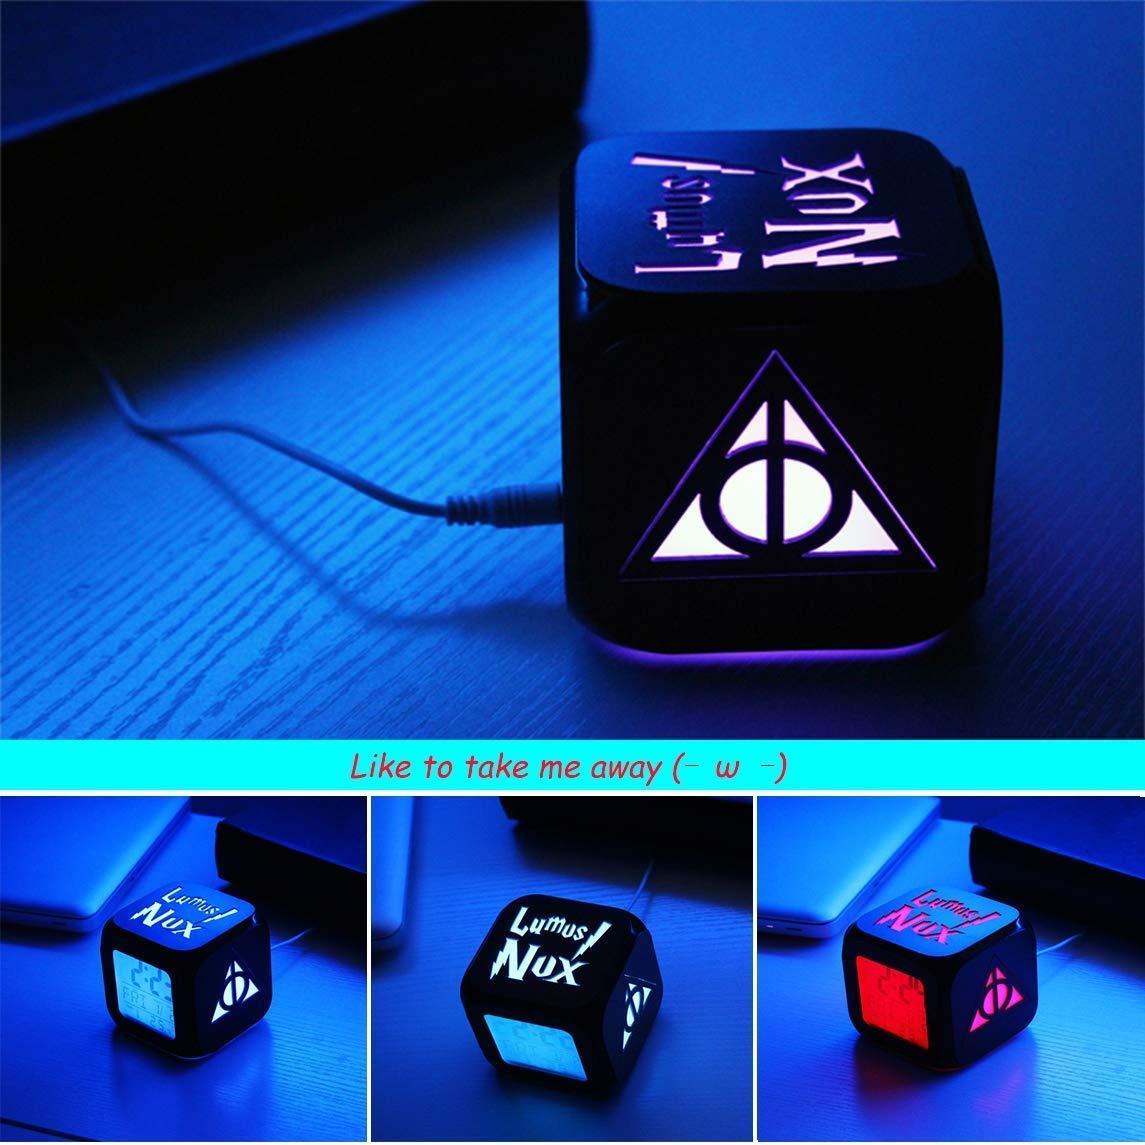 Nei/%Yi NEIYI R/éveil St/ér/éo 3D Harry Potter LED Silencieuse Veilleuse Technologie Mode R/éveil Mort Sacrement Sept Couleurs